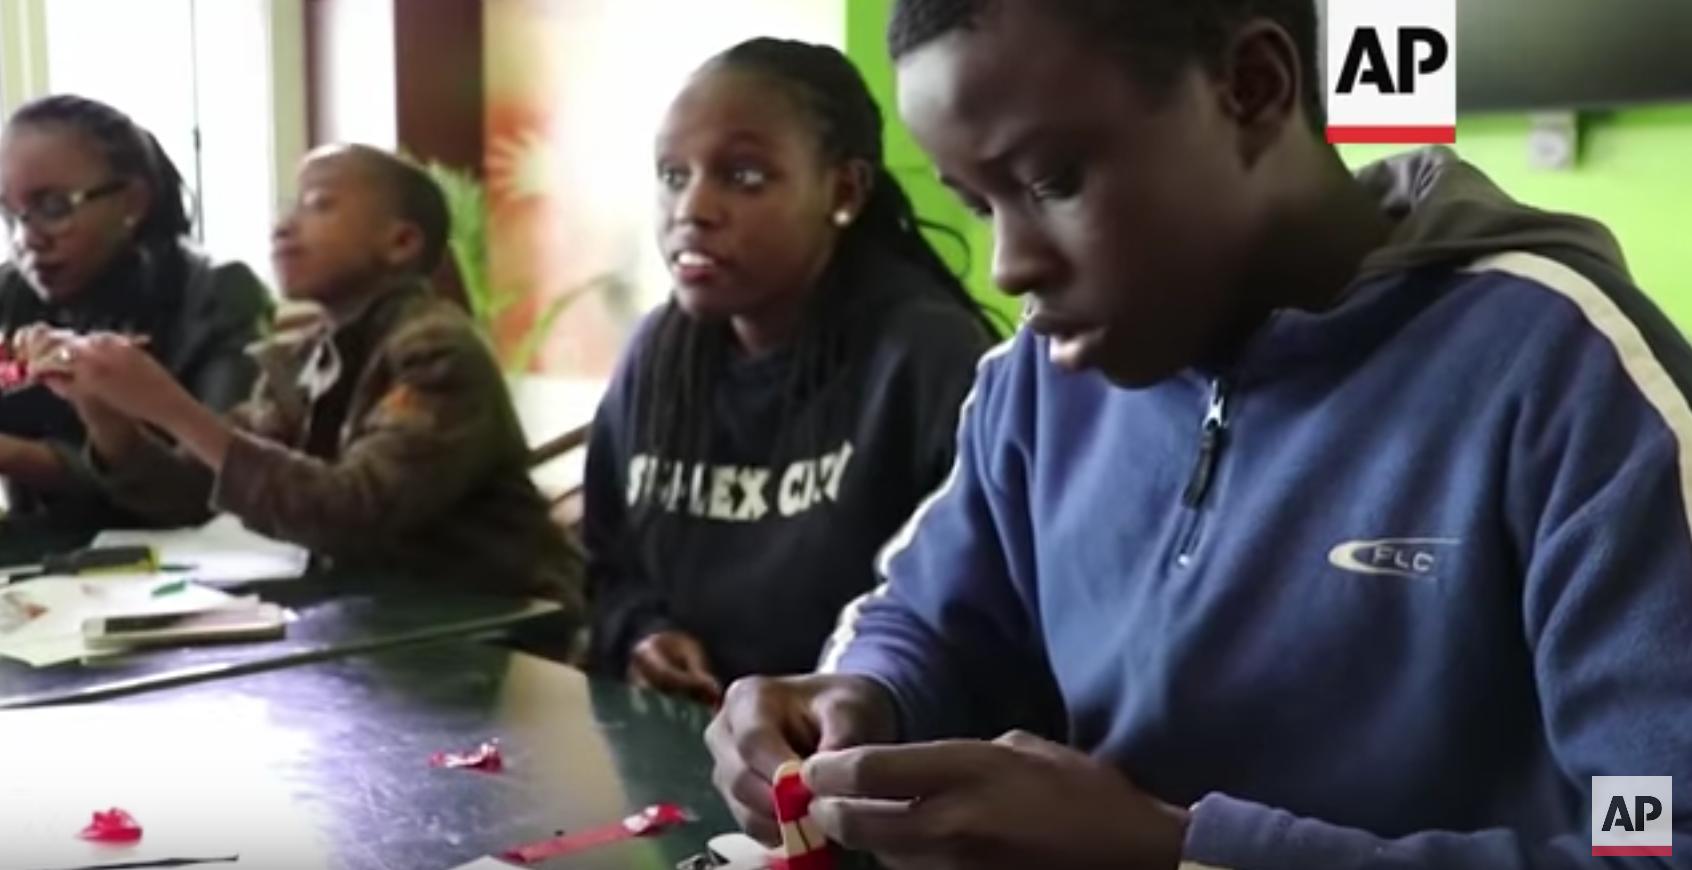 Slum Children Given Hands-On Tech Training – Associated Press (image)